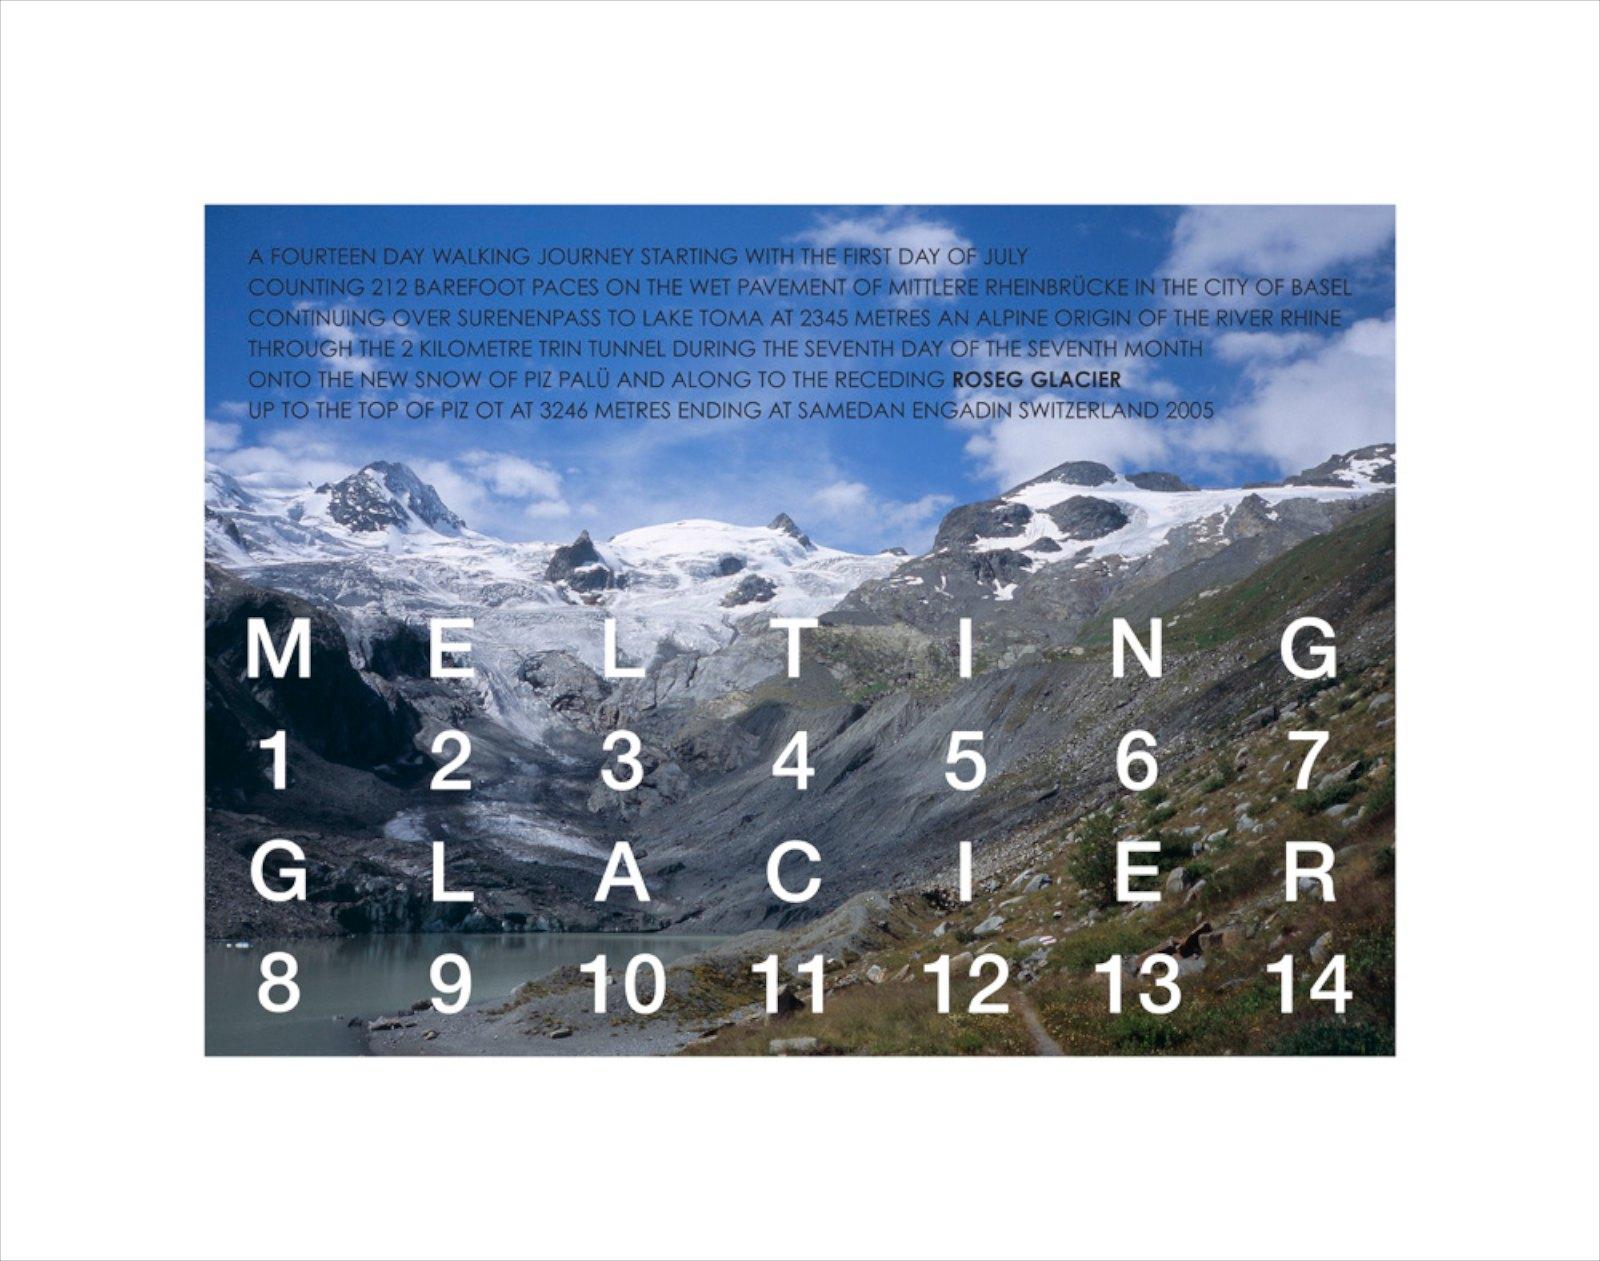 Melting Glacier, Switzerland 2005, Giclée print, 43 x 55 cm